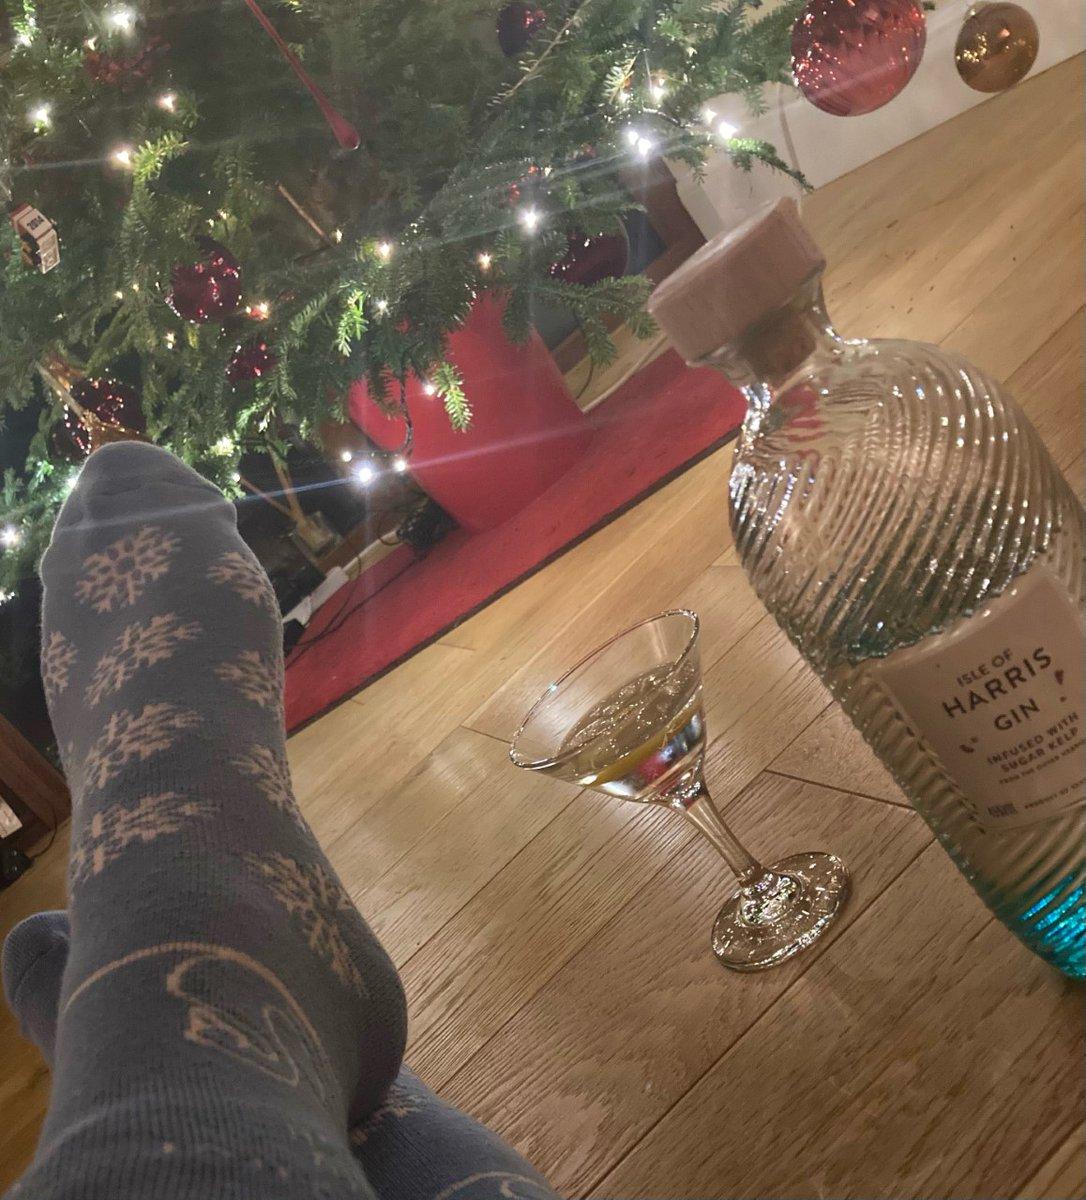 What a pleasant way to kick off the festive season! #QMUChristmasSocks .